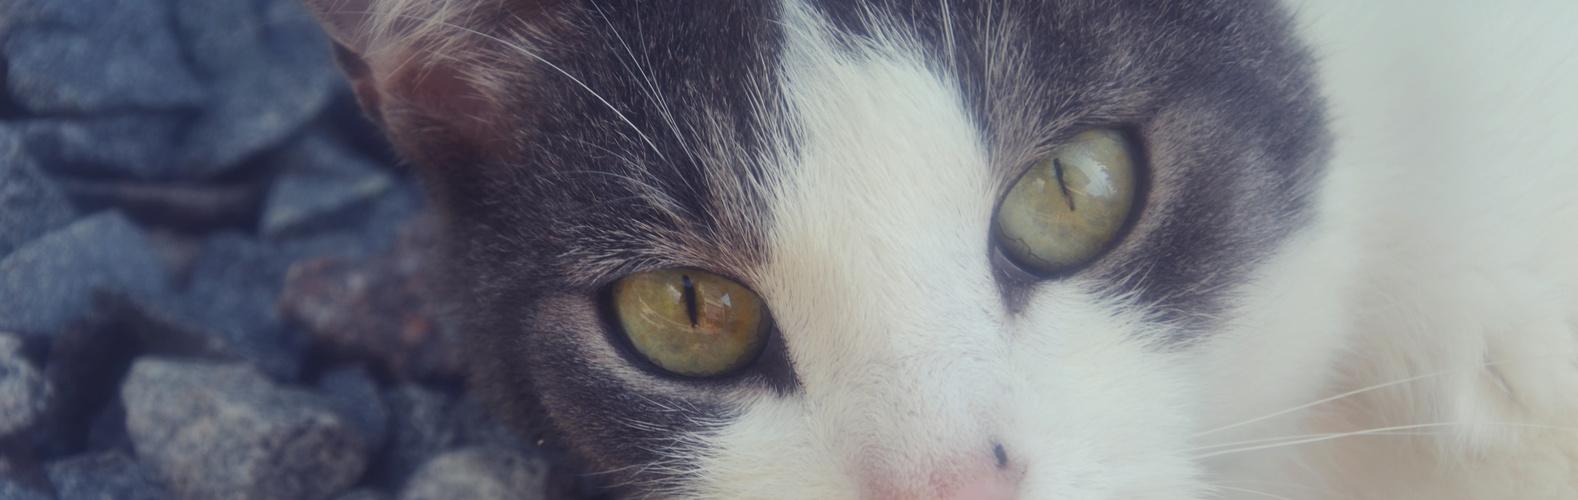 #cat #eyes